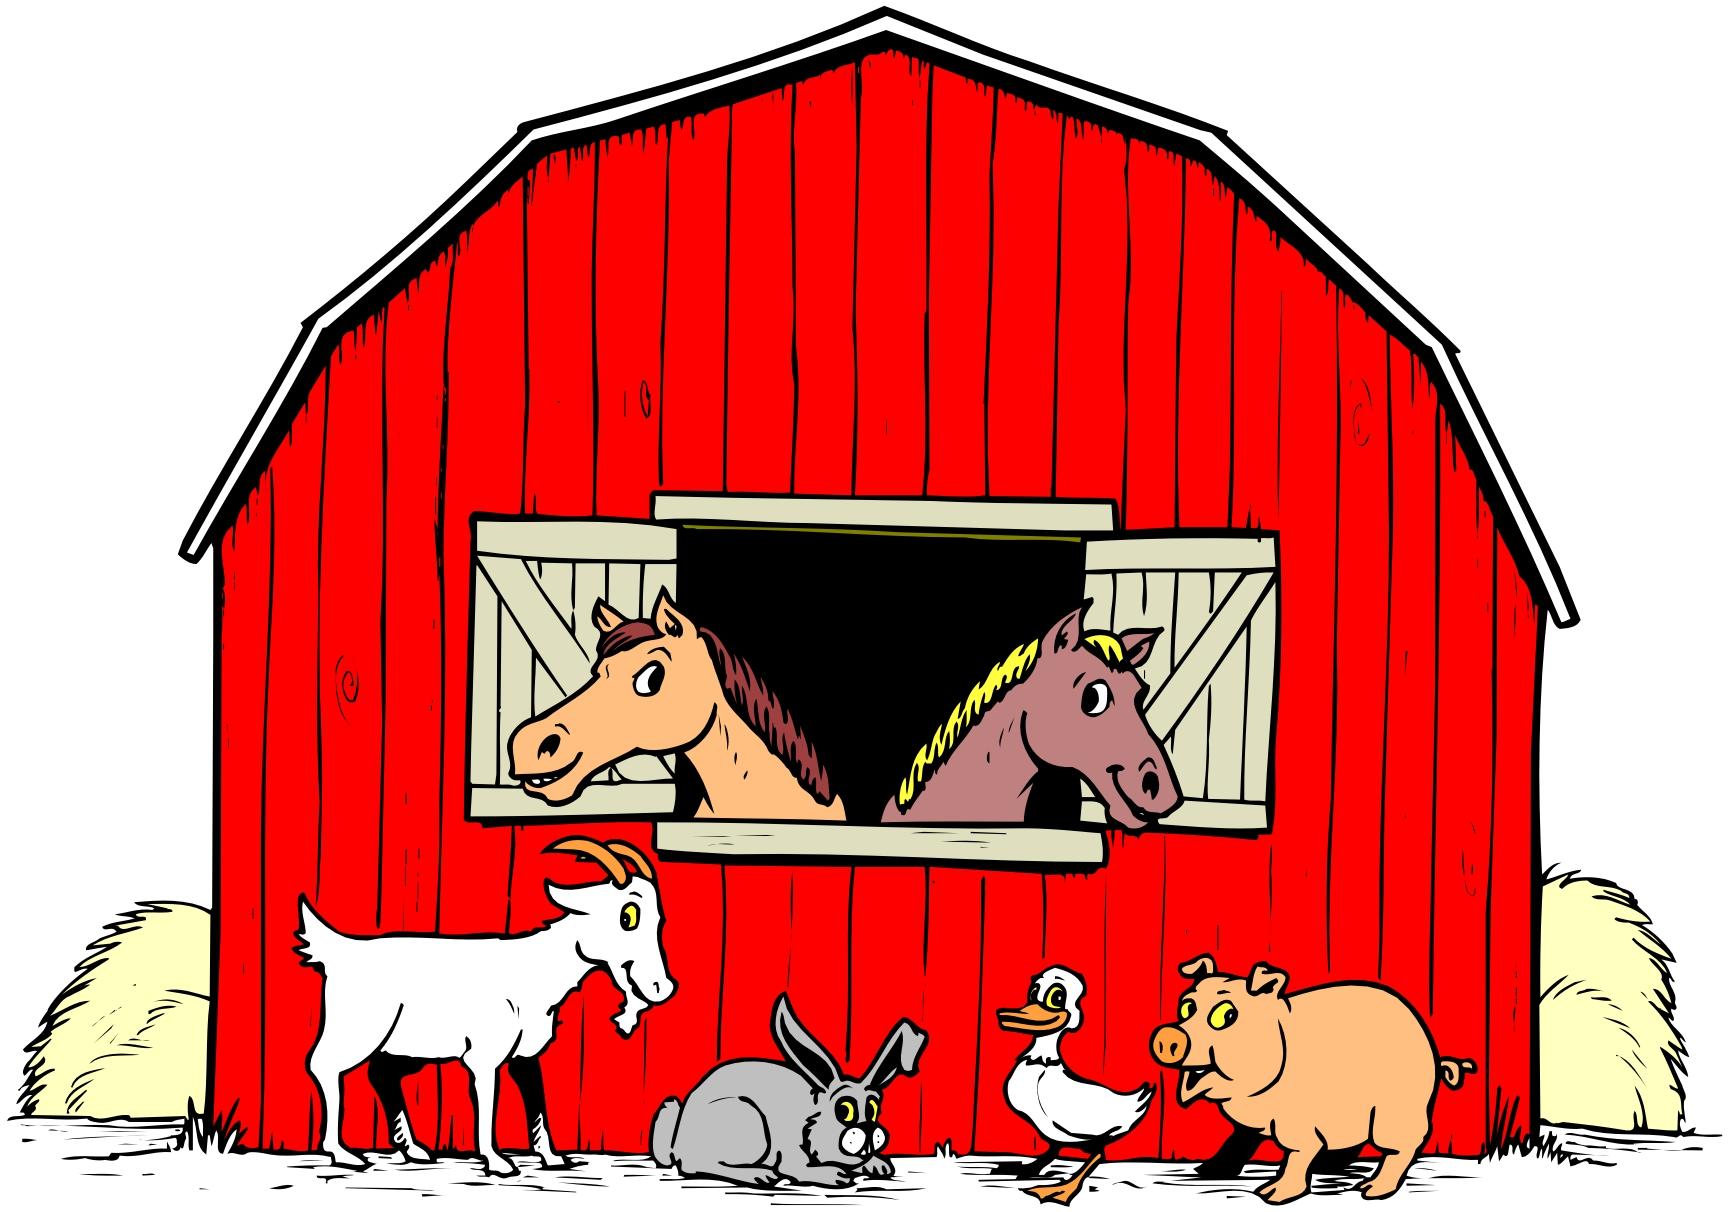 Farm cartoon clipart image royalty free download Farm animals cartoon clipart - Cliparting.com image royalty free download